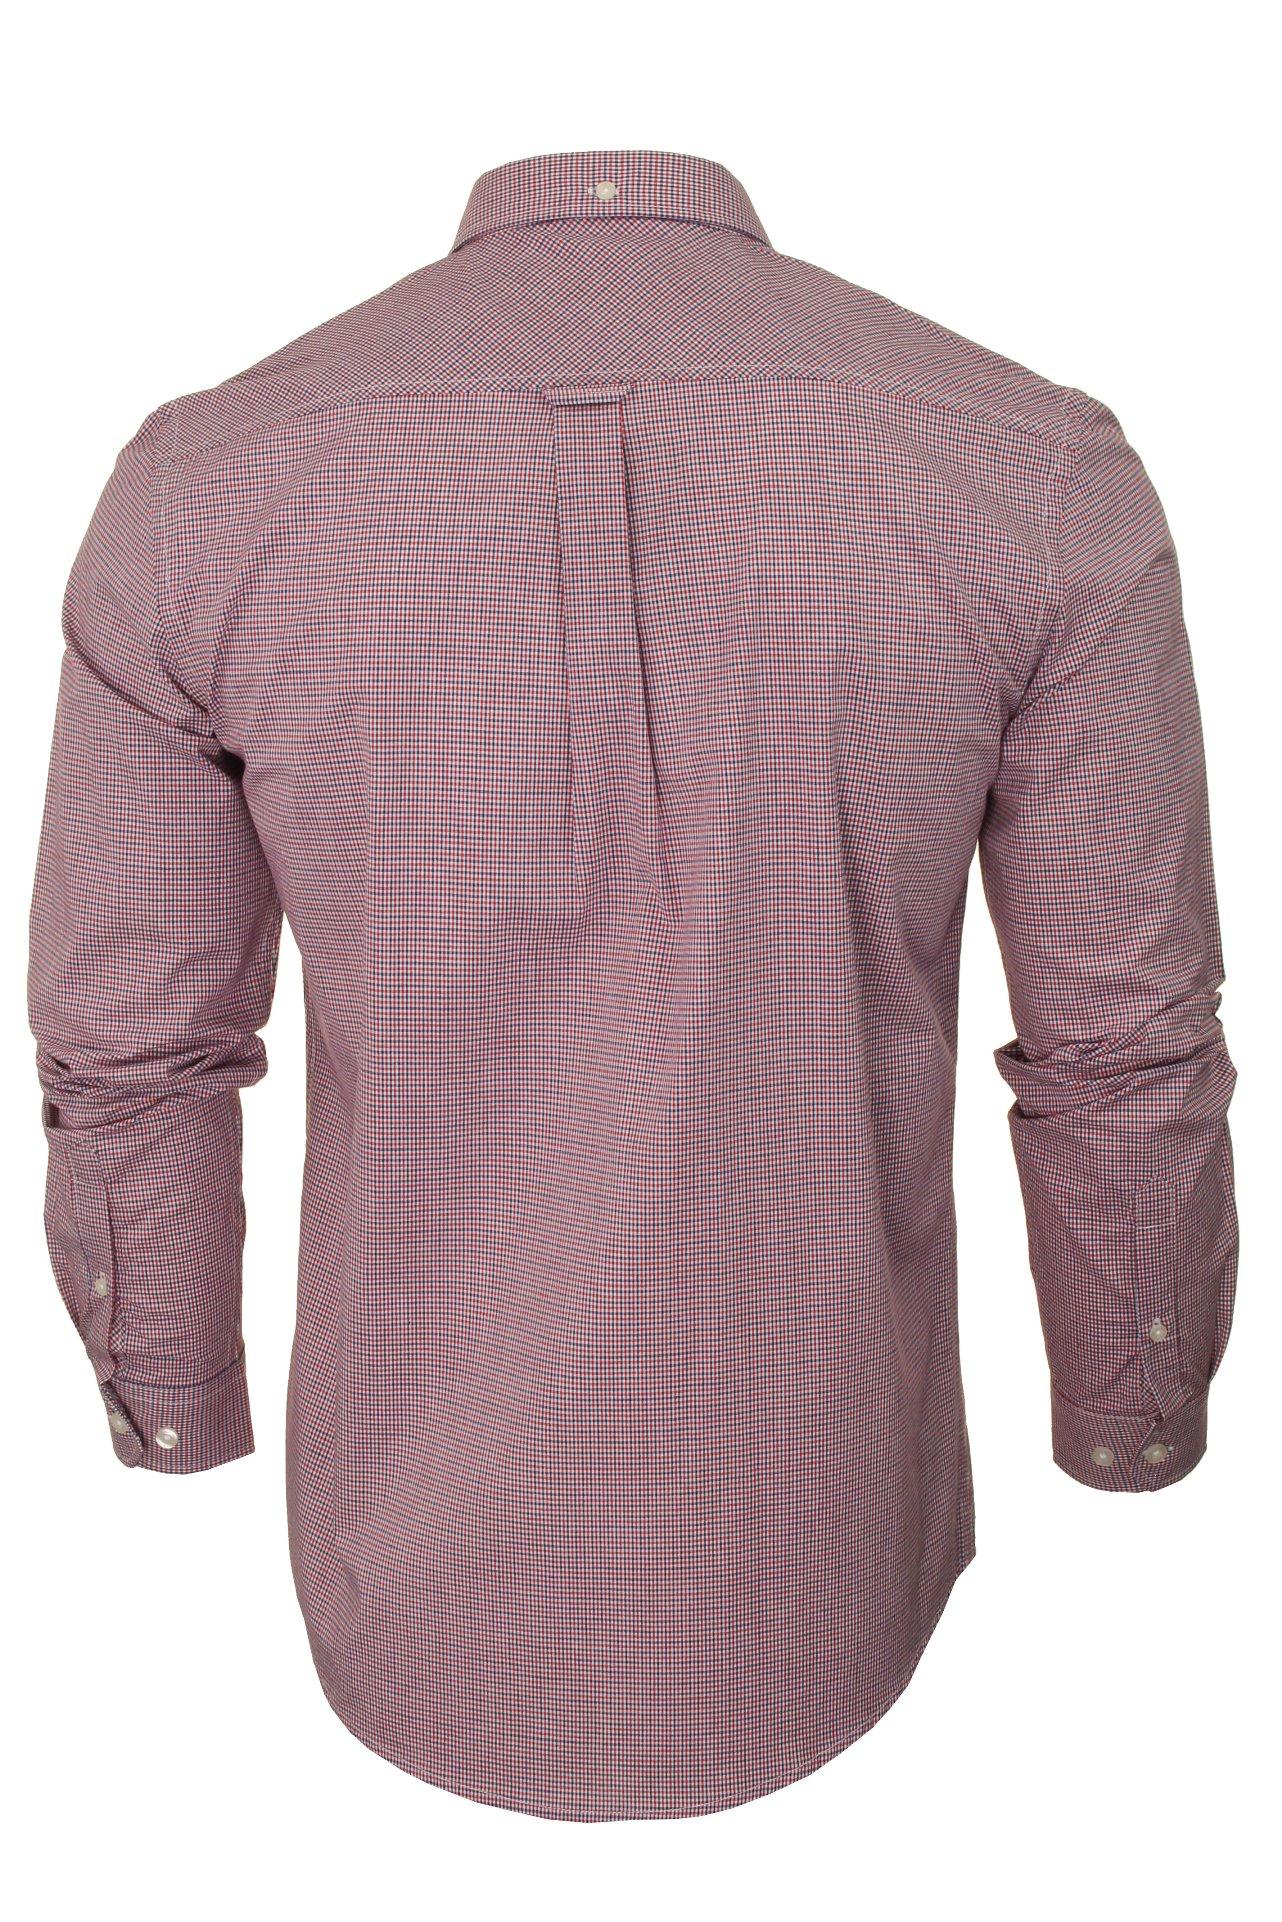 Ben-Sherman-Men-039-s-Long-Sleeved-Gingham-Check-Shirt thumbnail 8